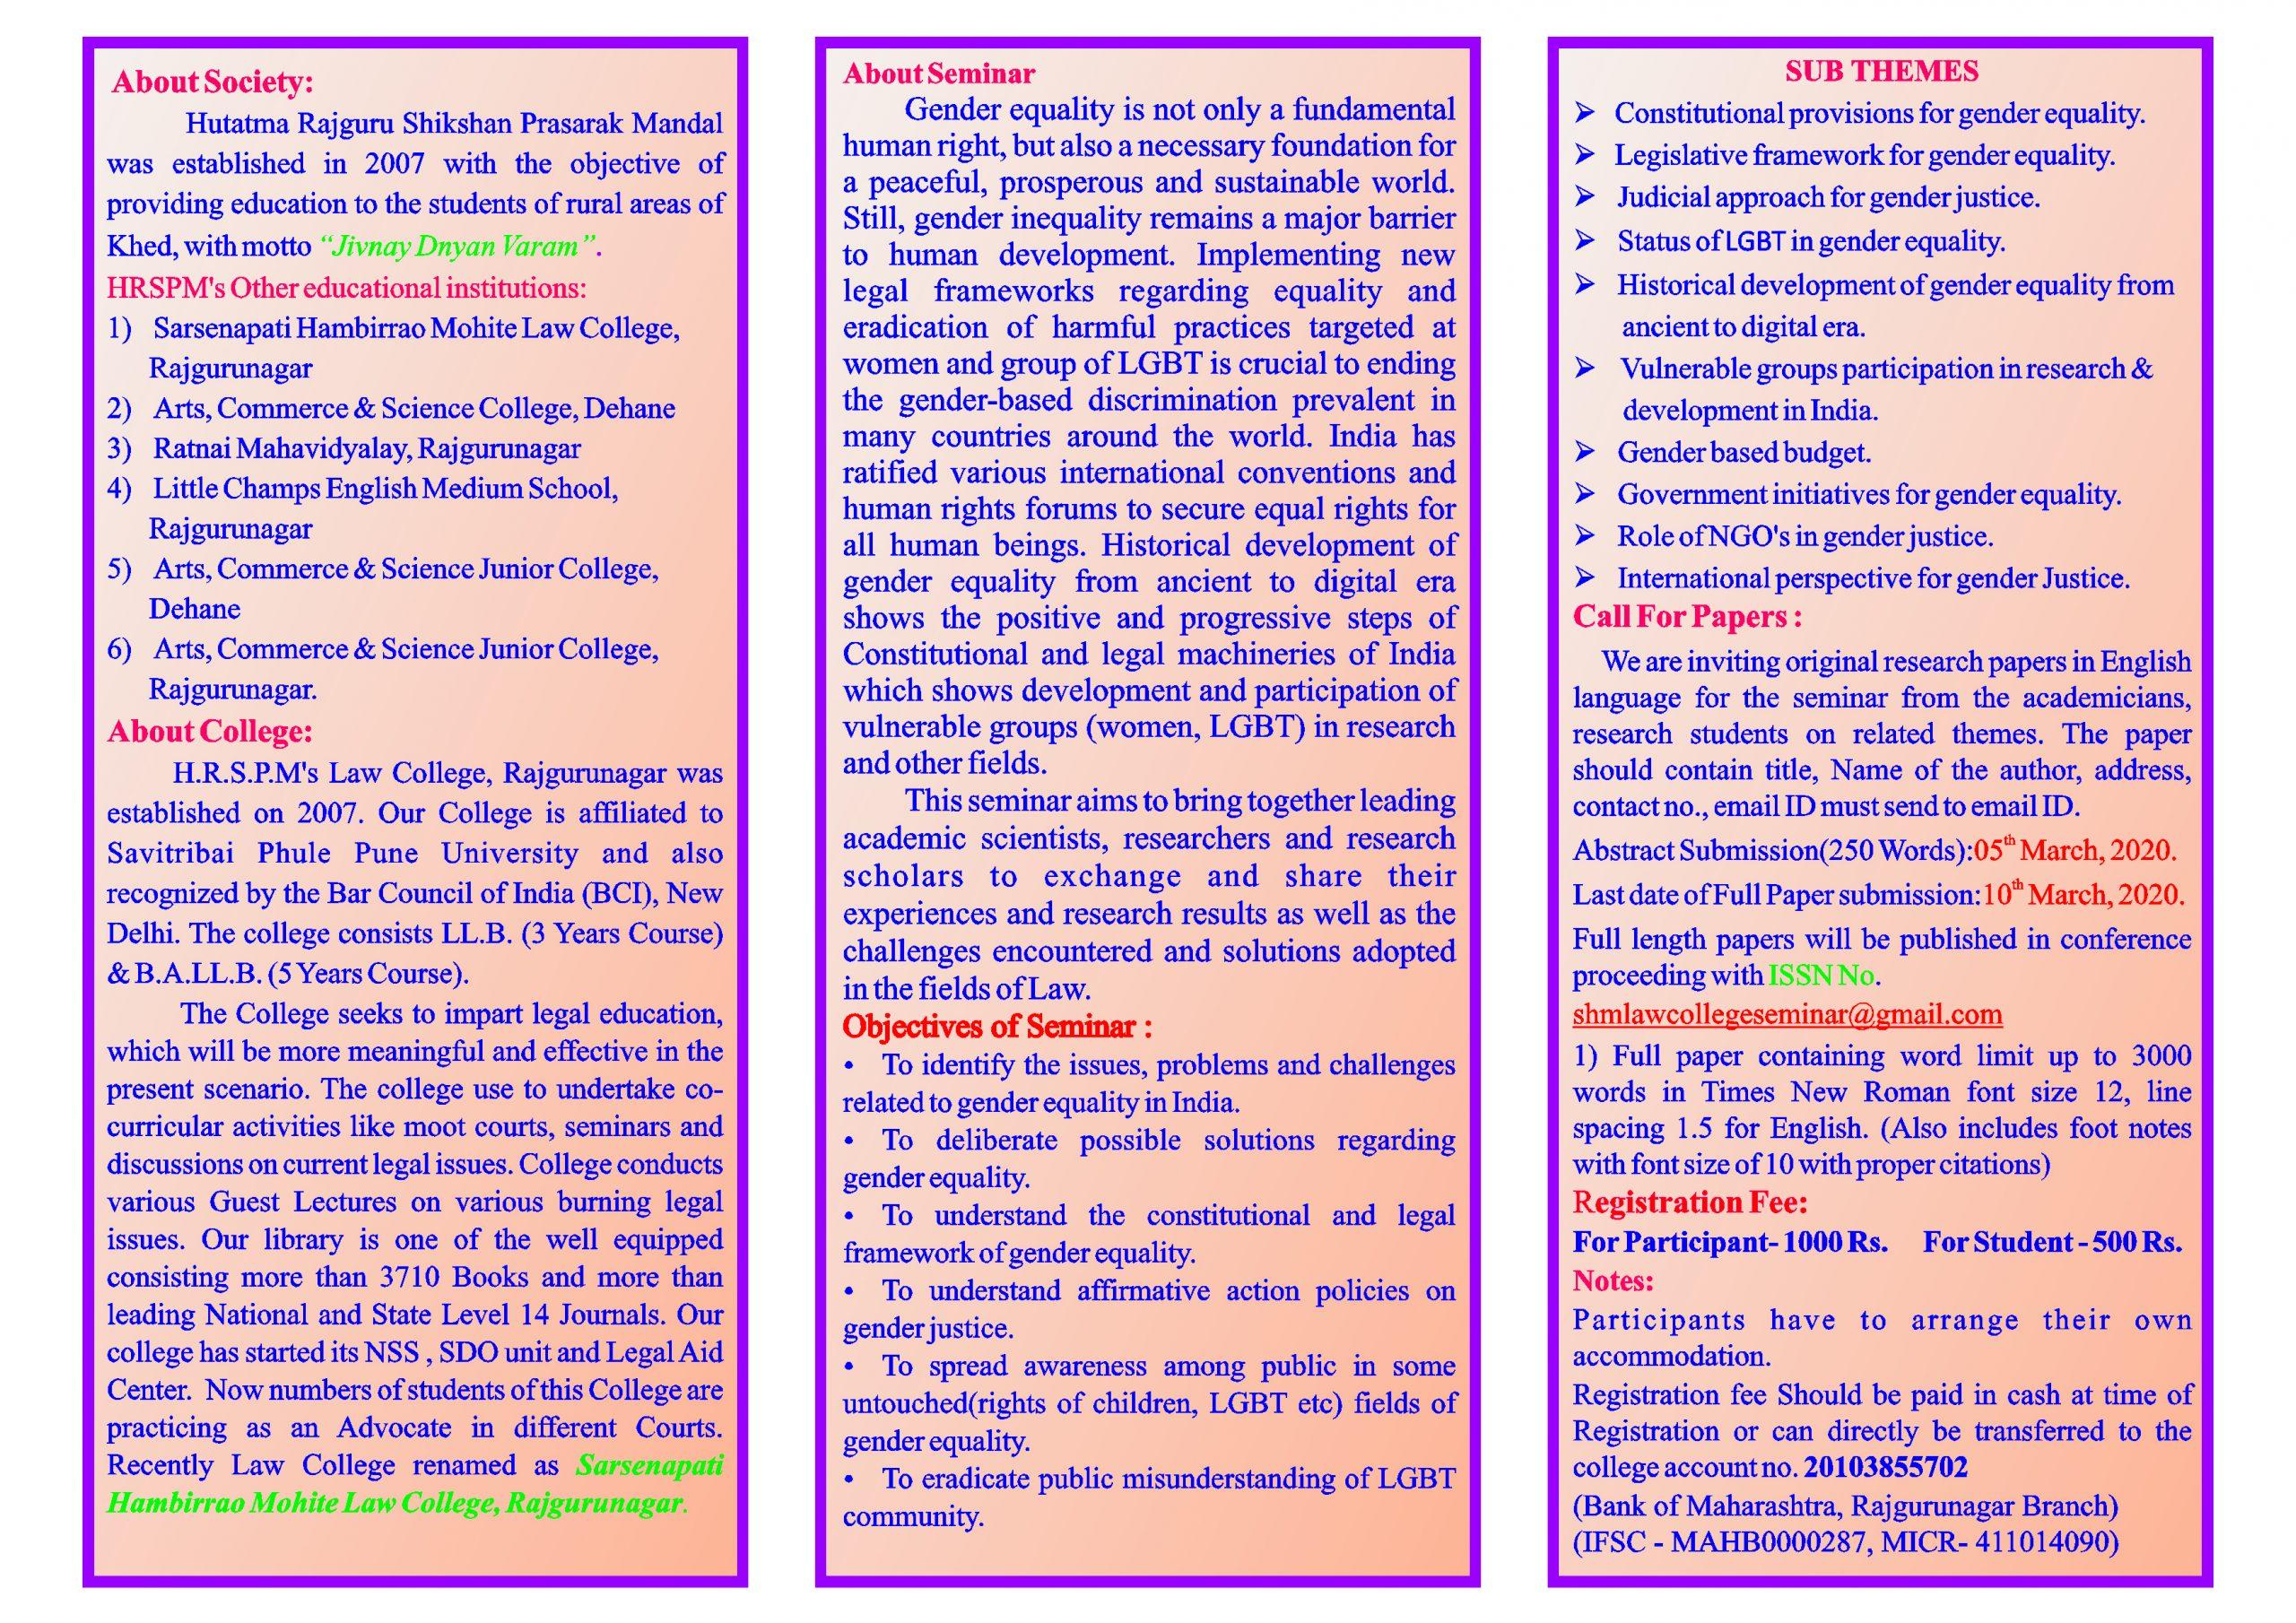 Seminar on Gender Justice at H.R.S.P.M's Law College, Rajgurunagar